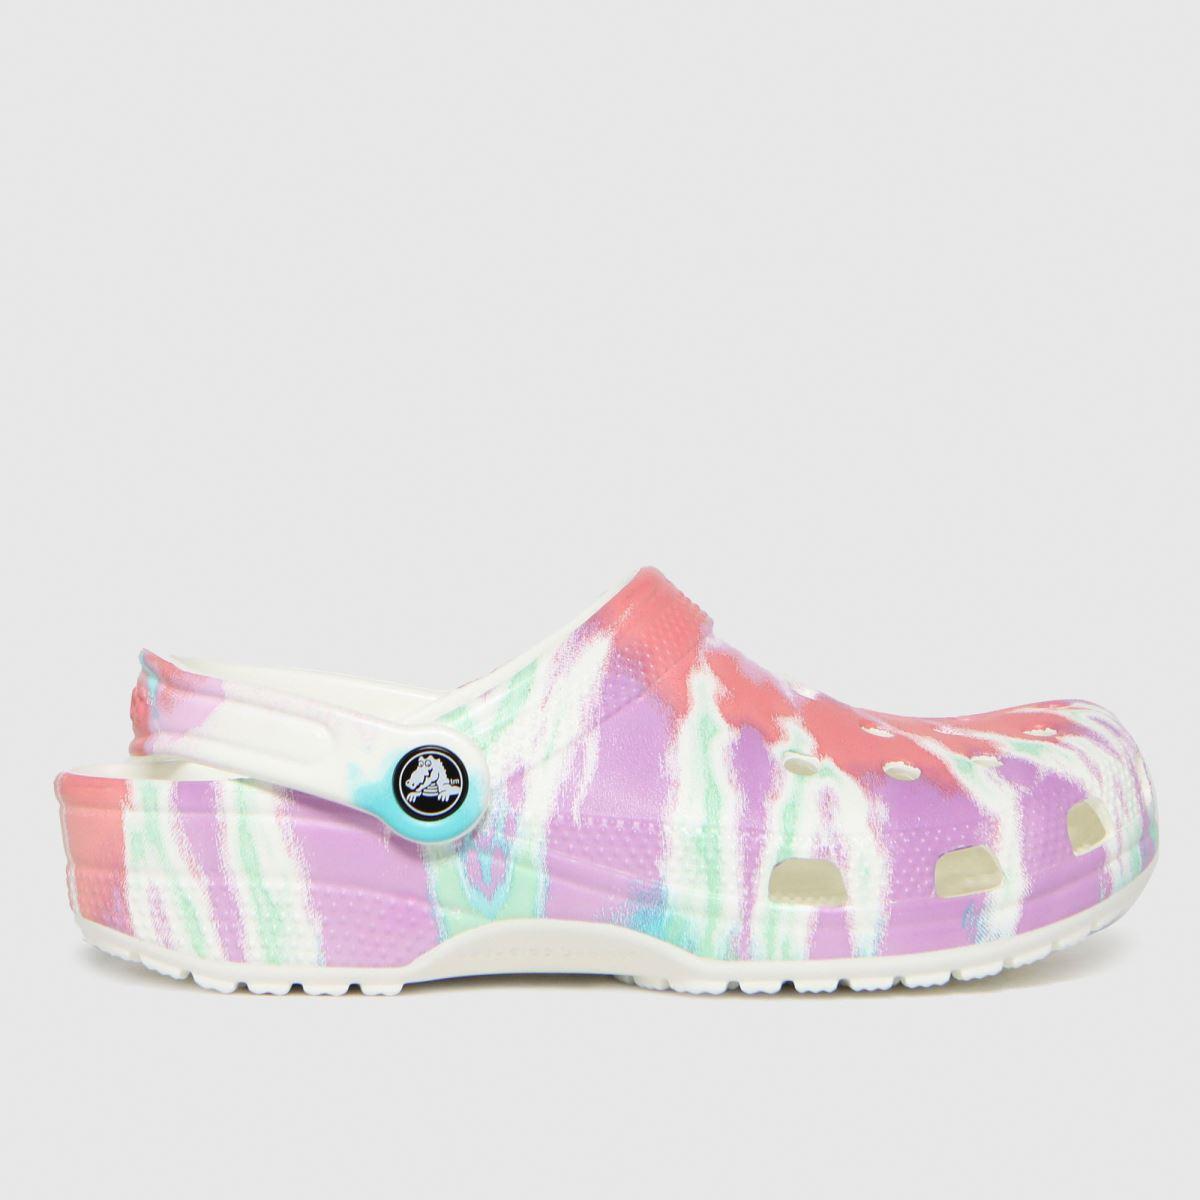 Crocs Purple Classic Clog Sandals